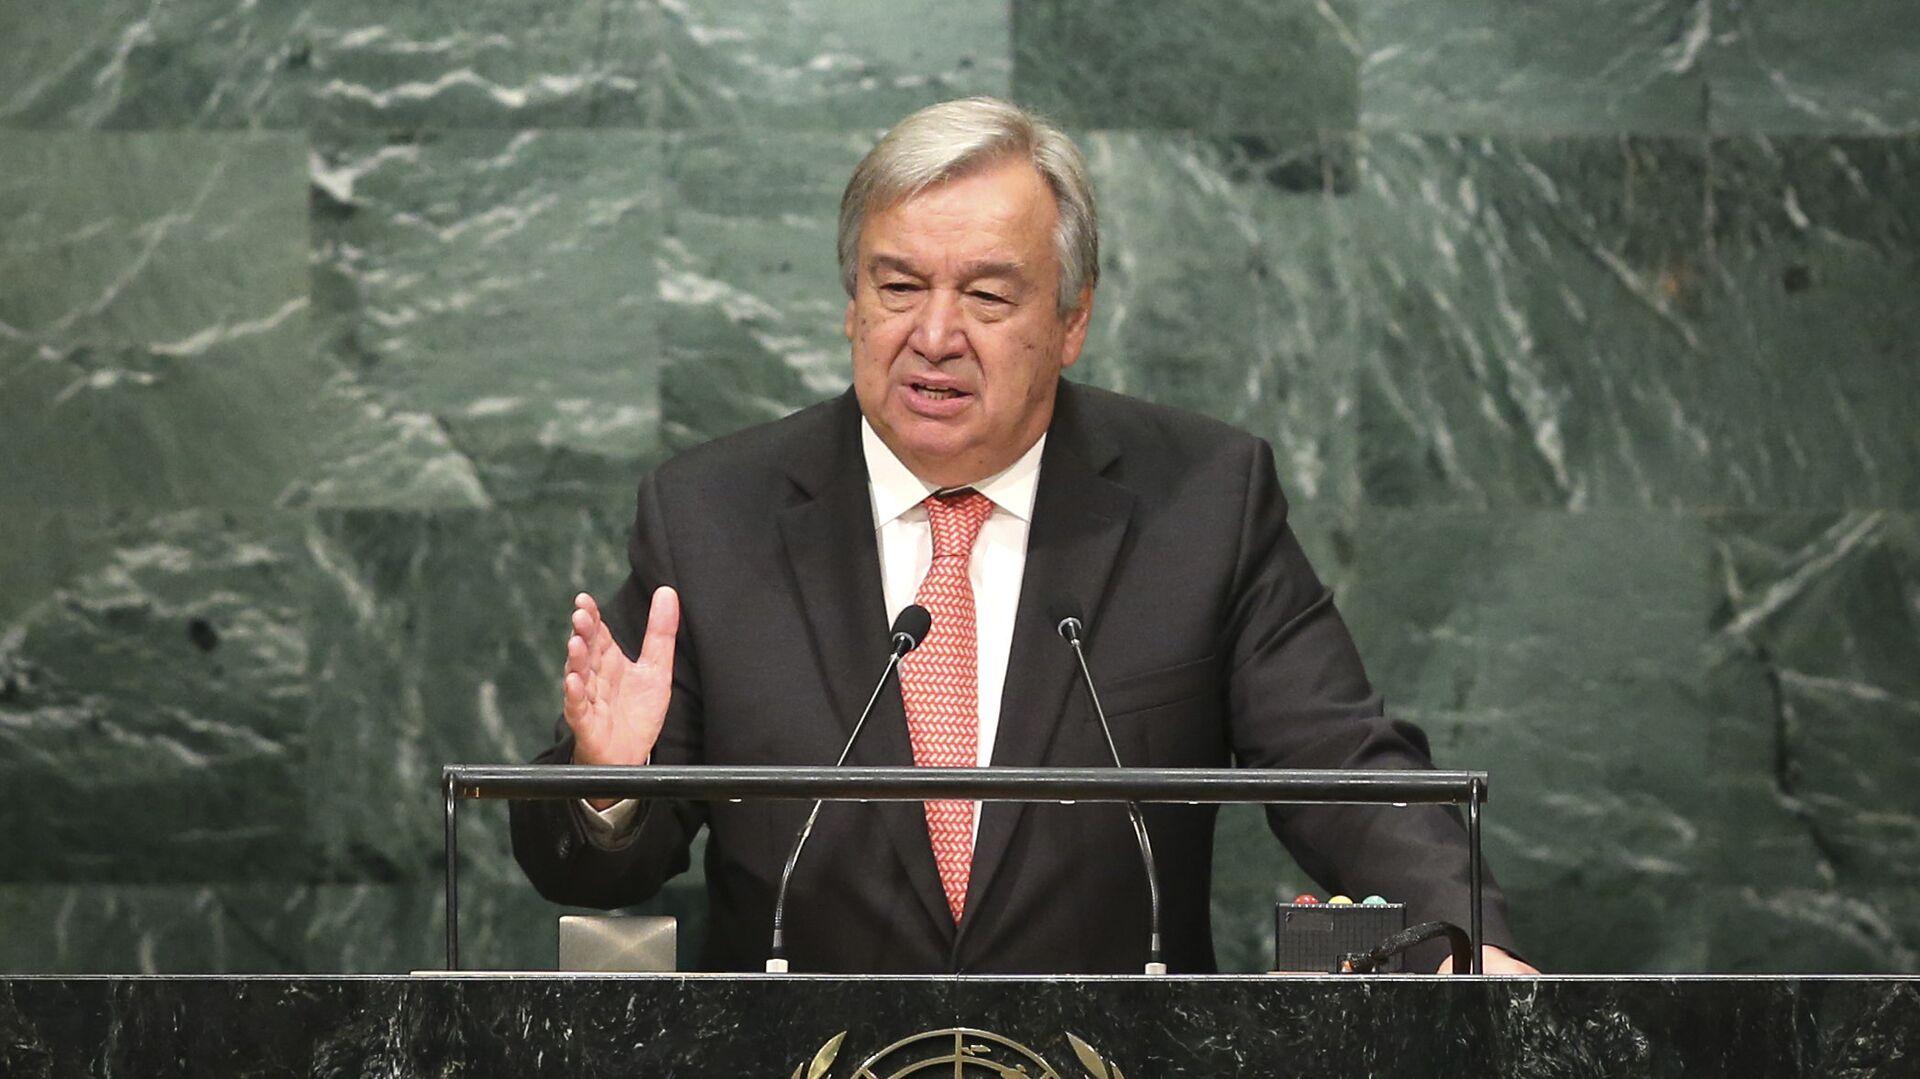 Антониу Гутерреш на заседании Генассамблеи ООН. 13 октября 2016 - РИА Новости, 1920, 26.01.2021